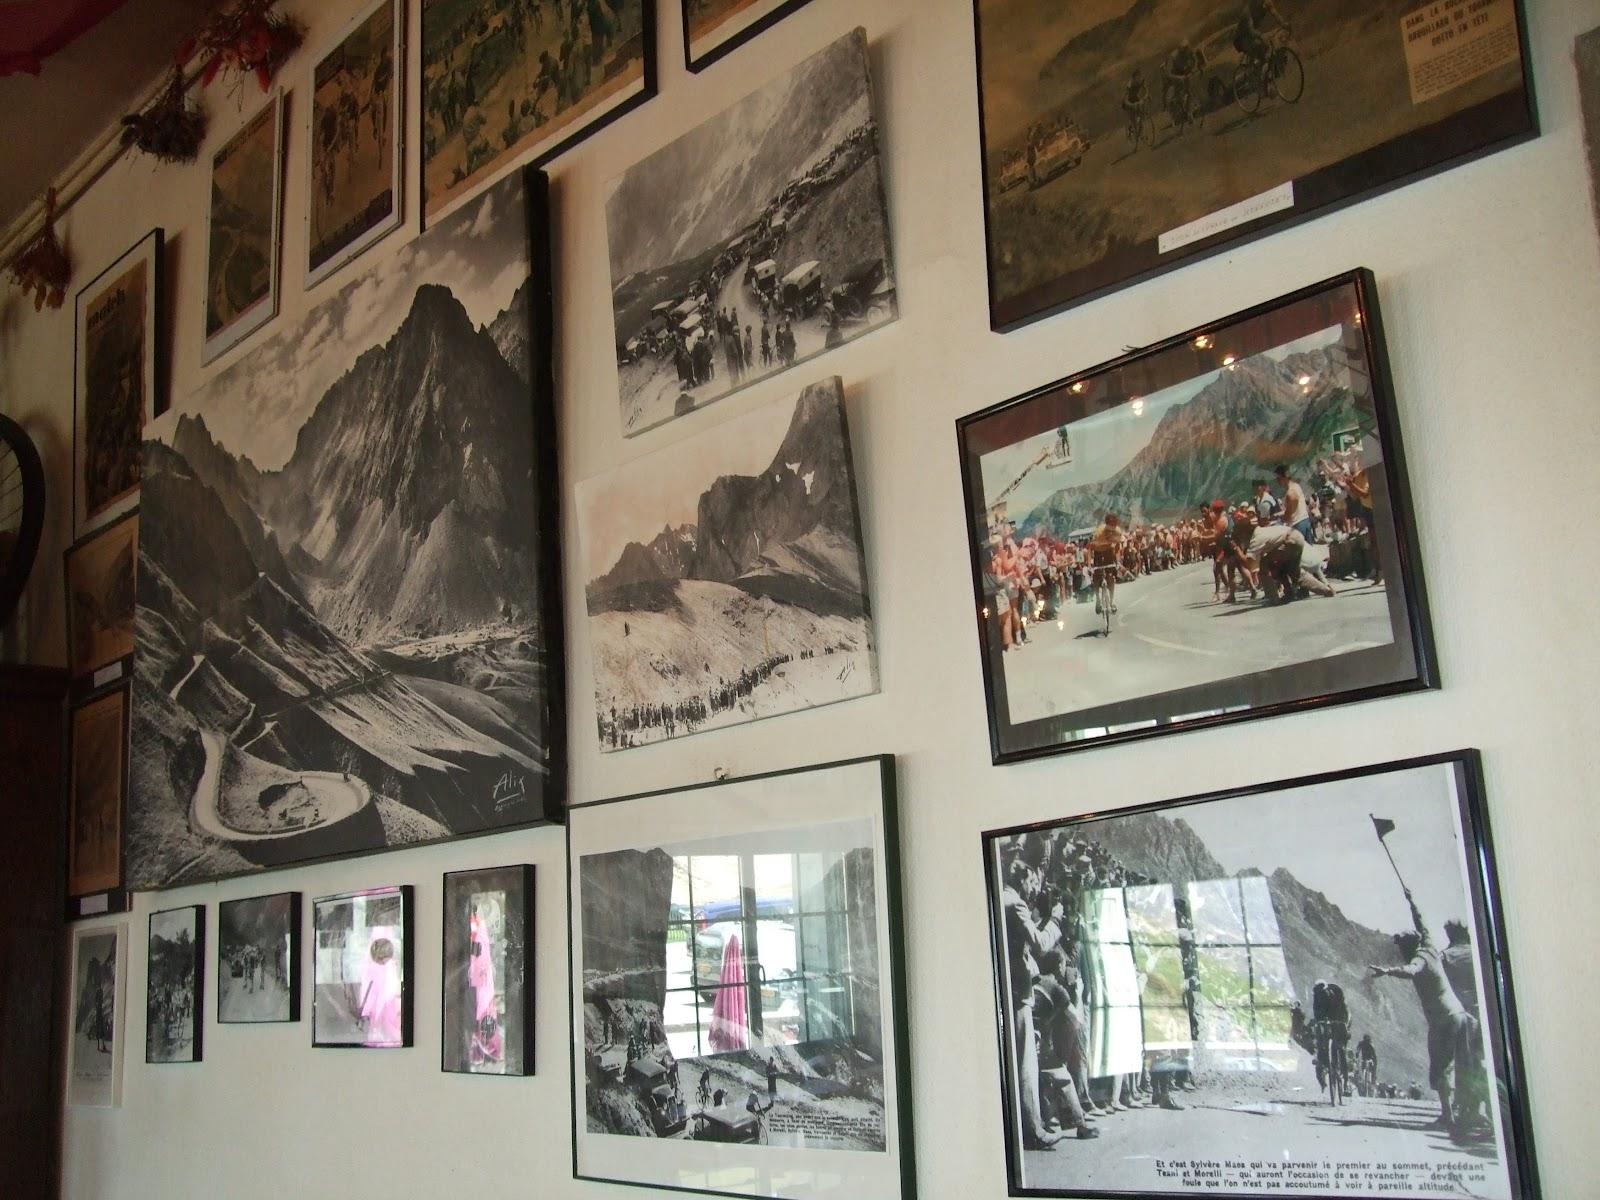 Climbing up Col du Tourmalet on bike - inside restaurant at the top